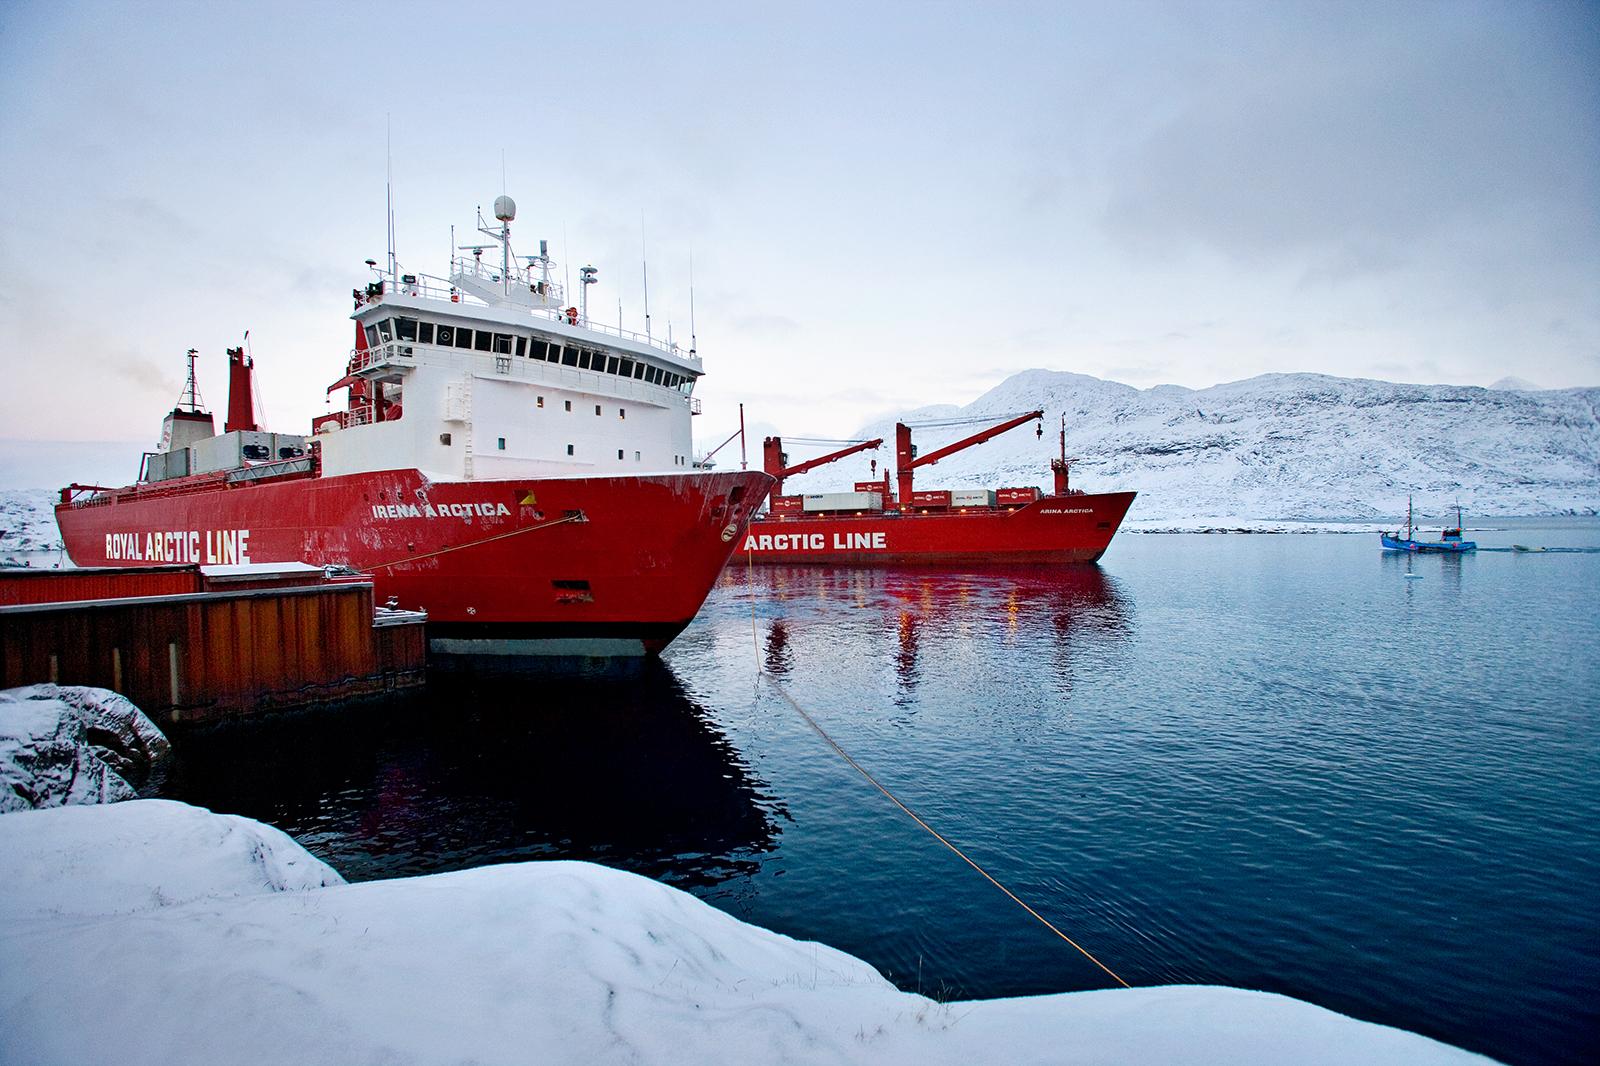 Arctic Line : Irena arctica royal arctic line